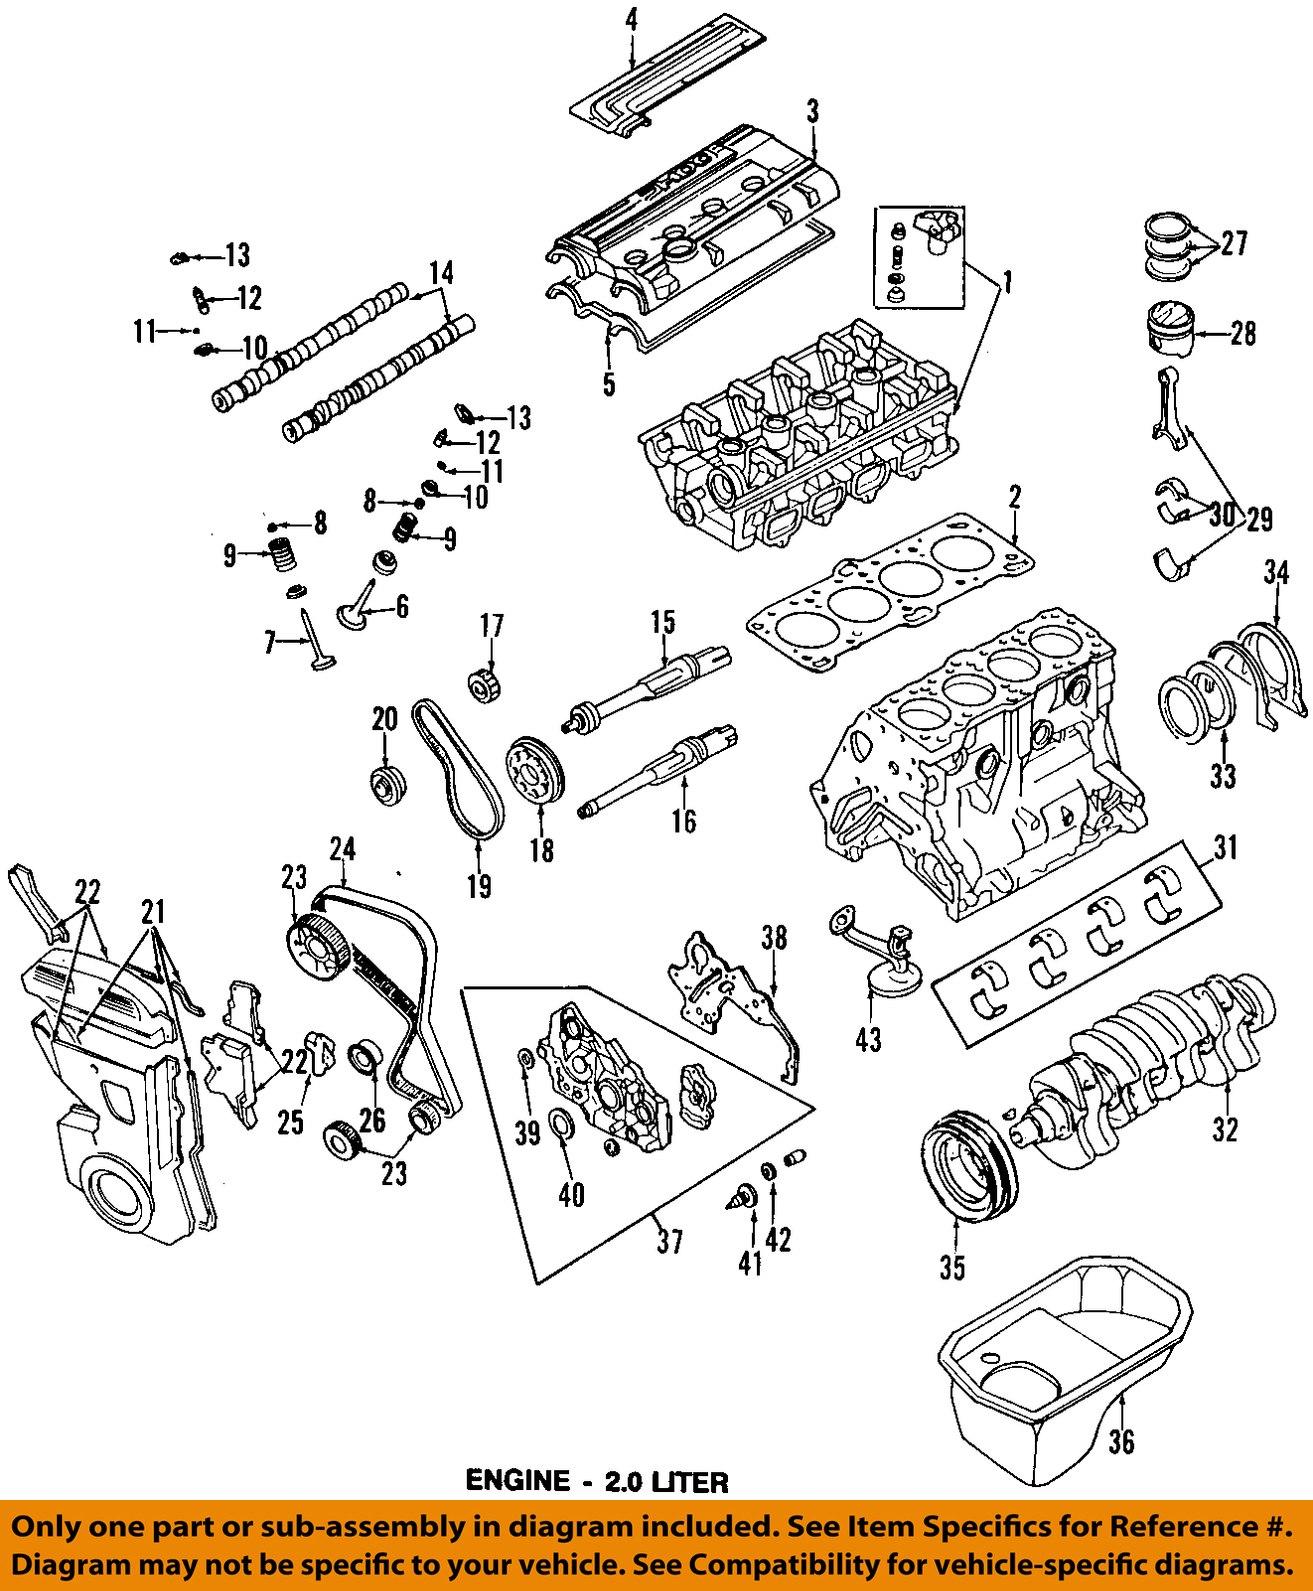 mitsubishi oem 91 98 galant engine crankshaft upper seal upper mitsubishi oem 91 98 galant engine crankshaft upper seal upper seal md741818